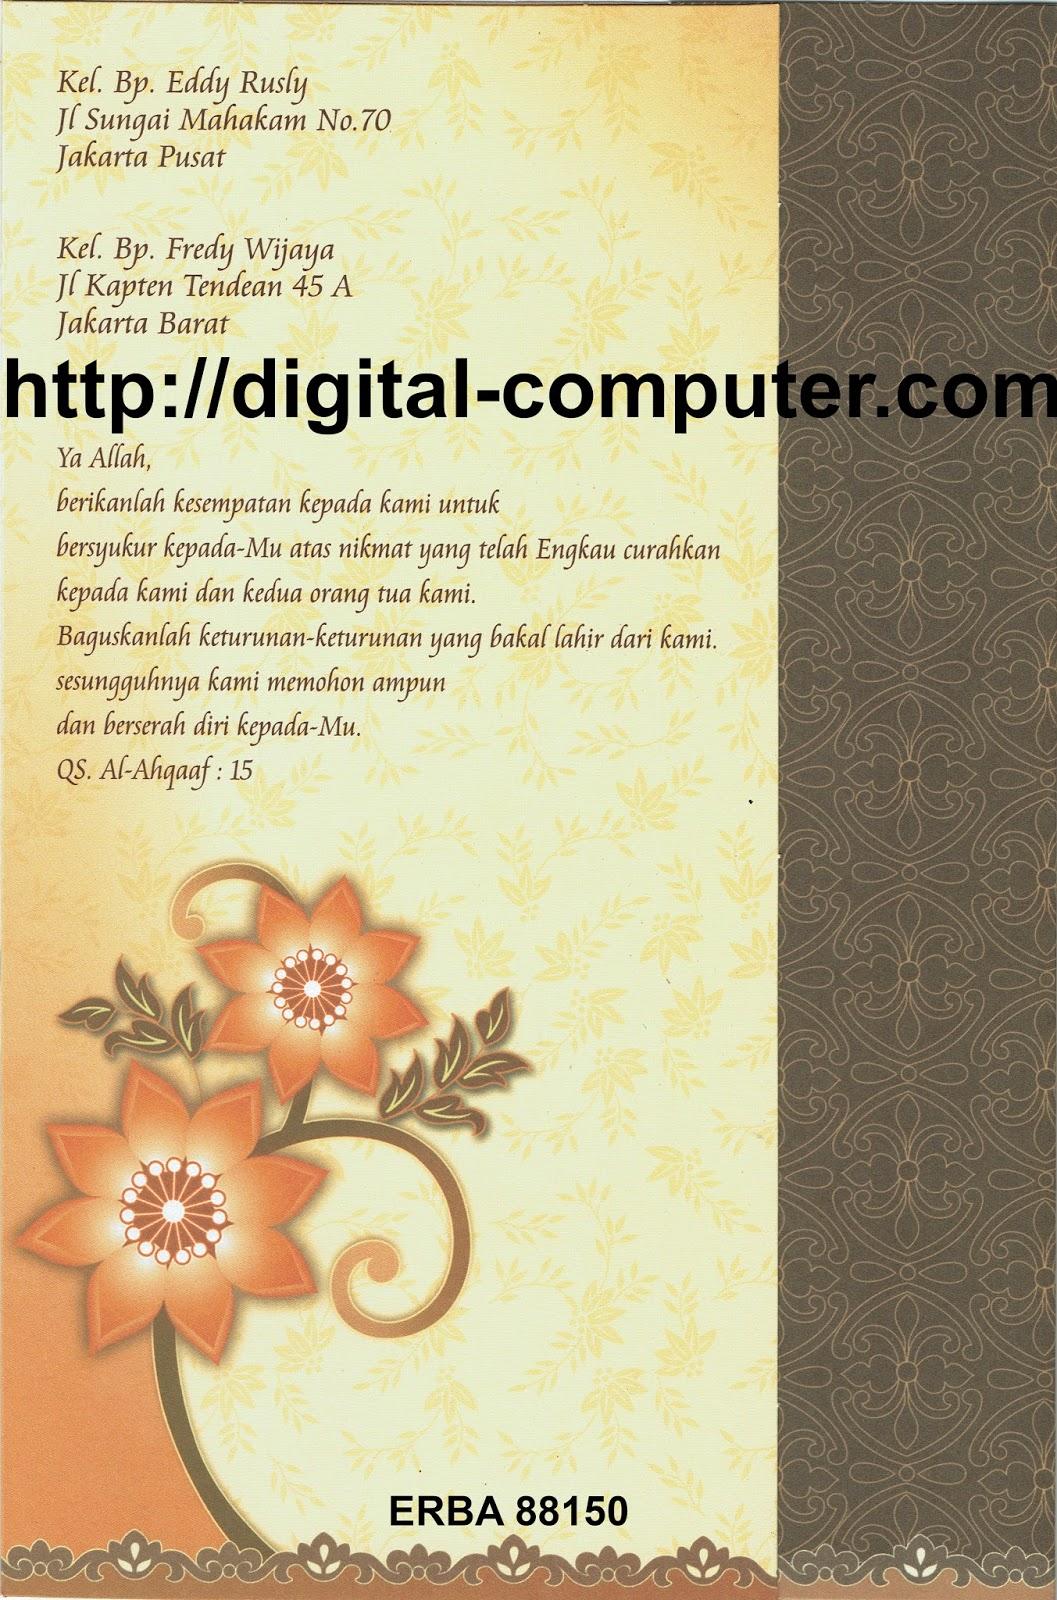 Undangan Softcover ERBA 88150